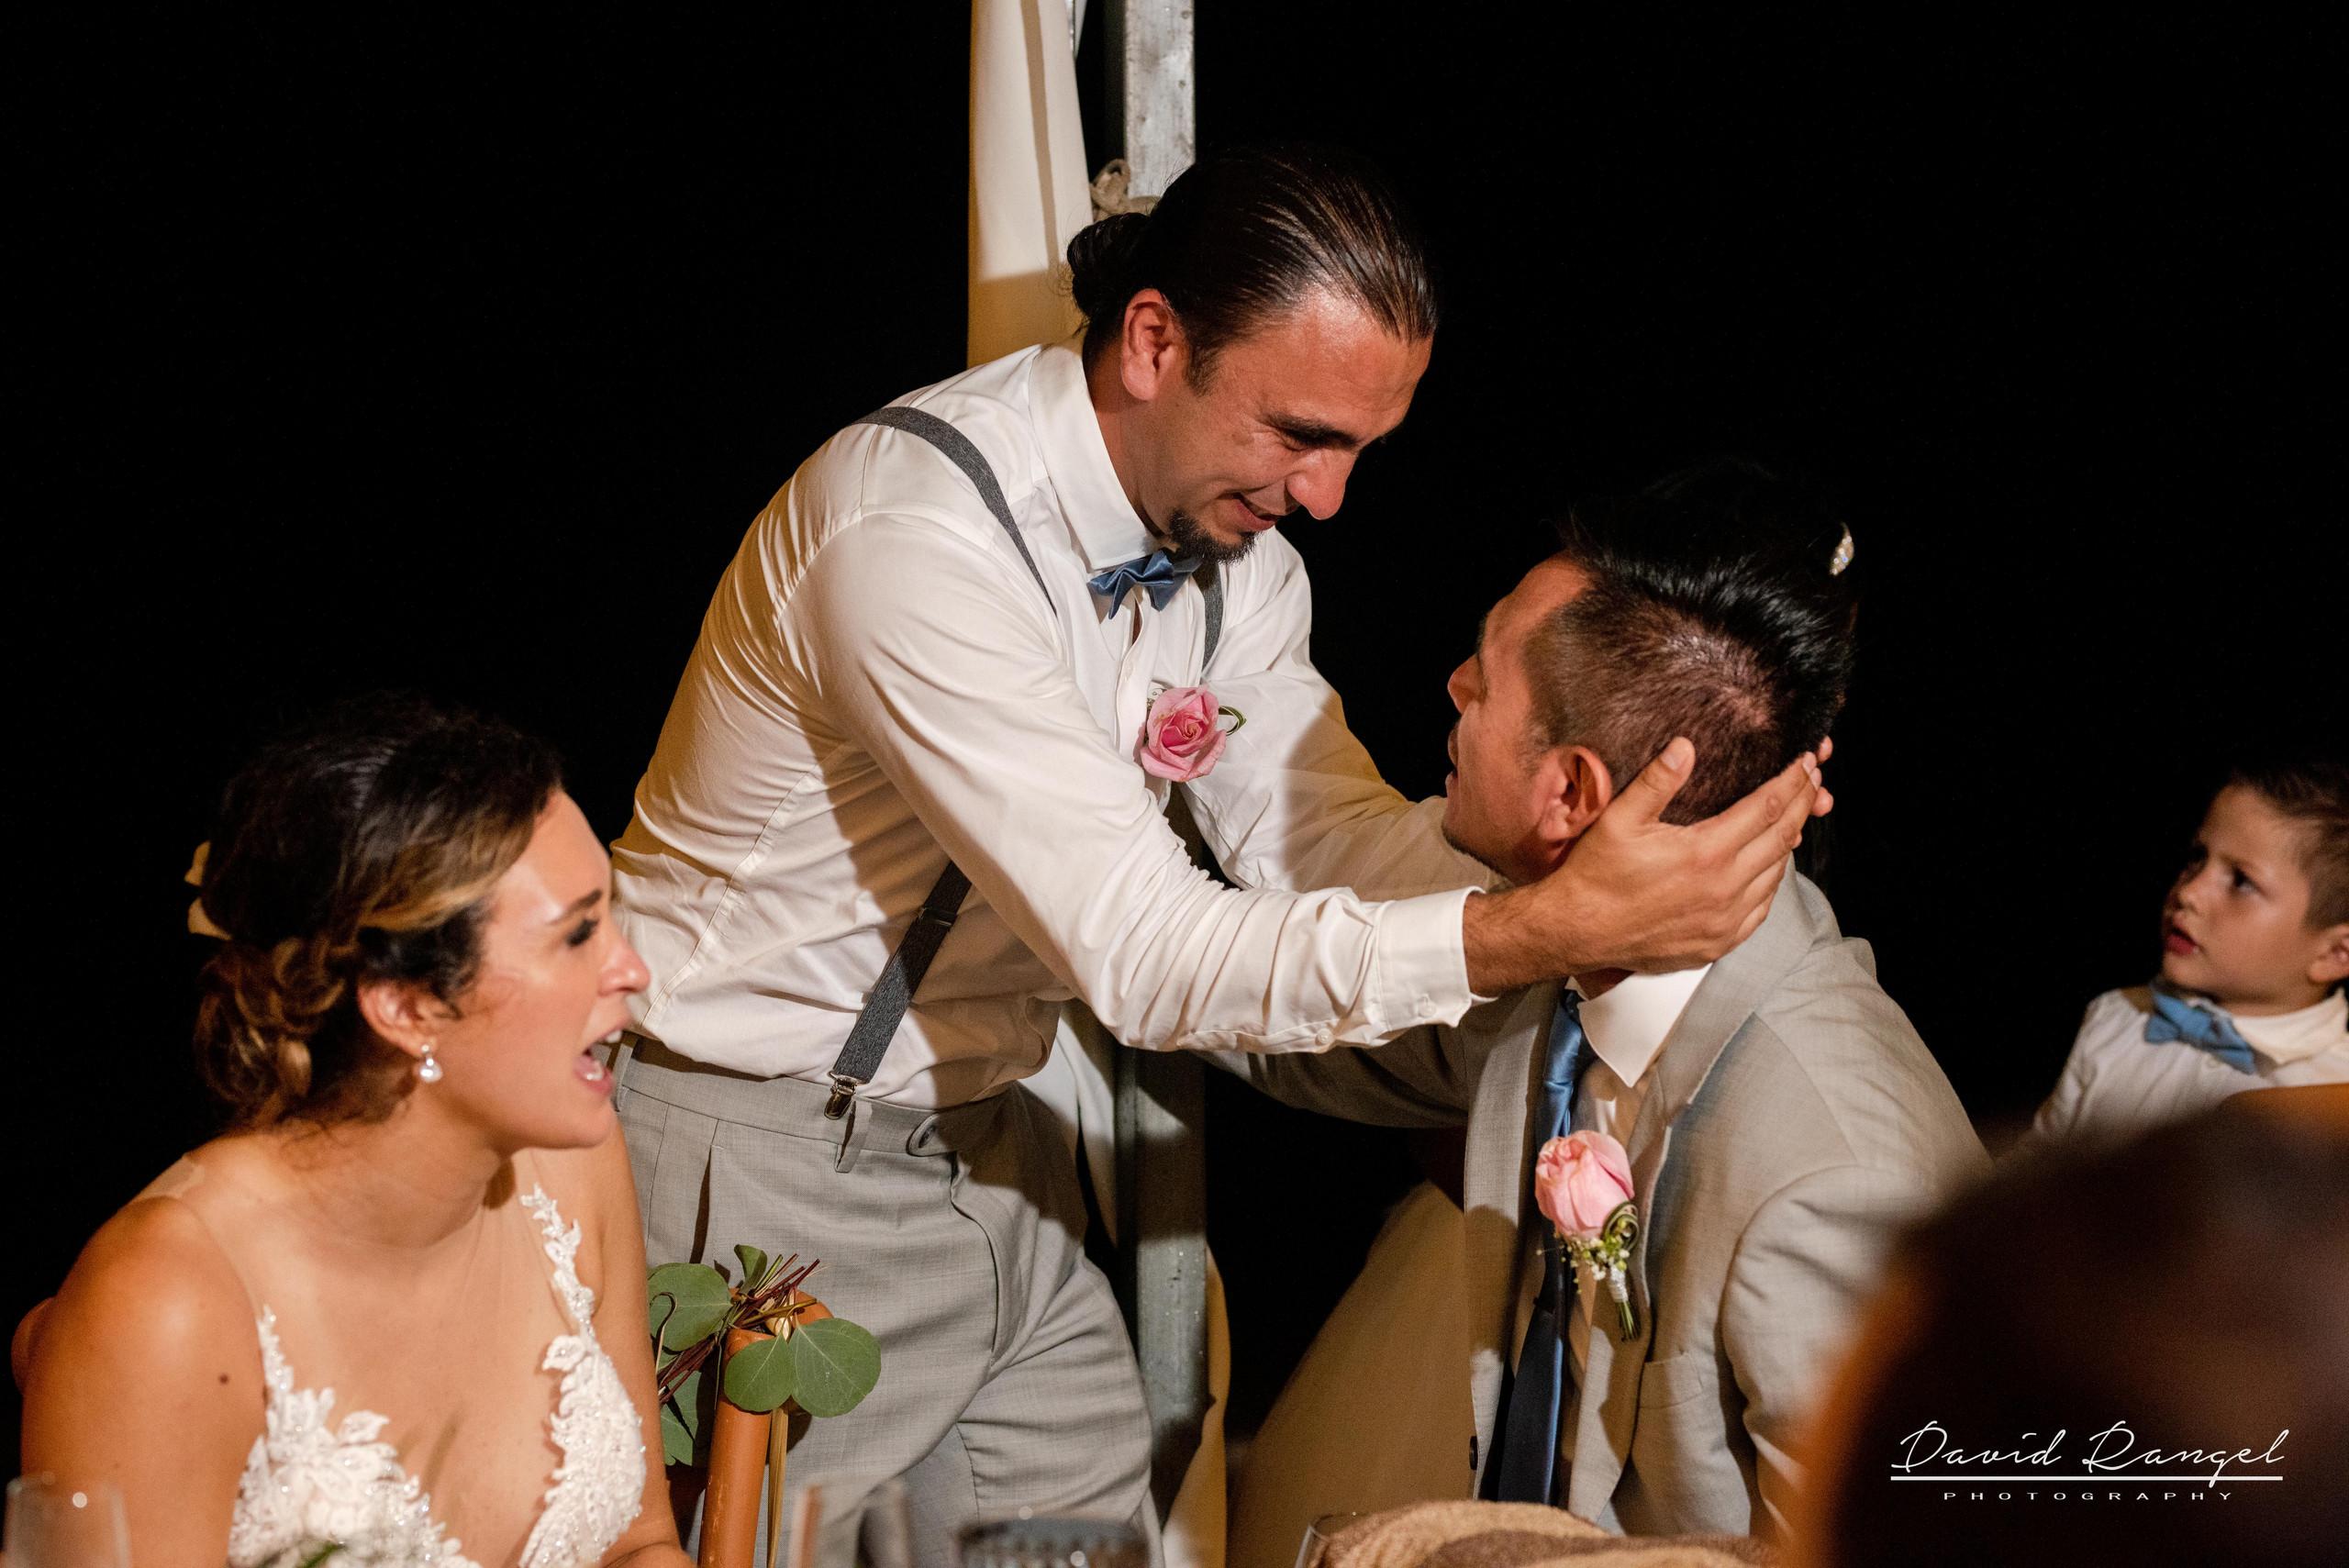 dinner+reception+wedding+guest+groom+bride+best+man+brother